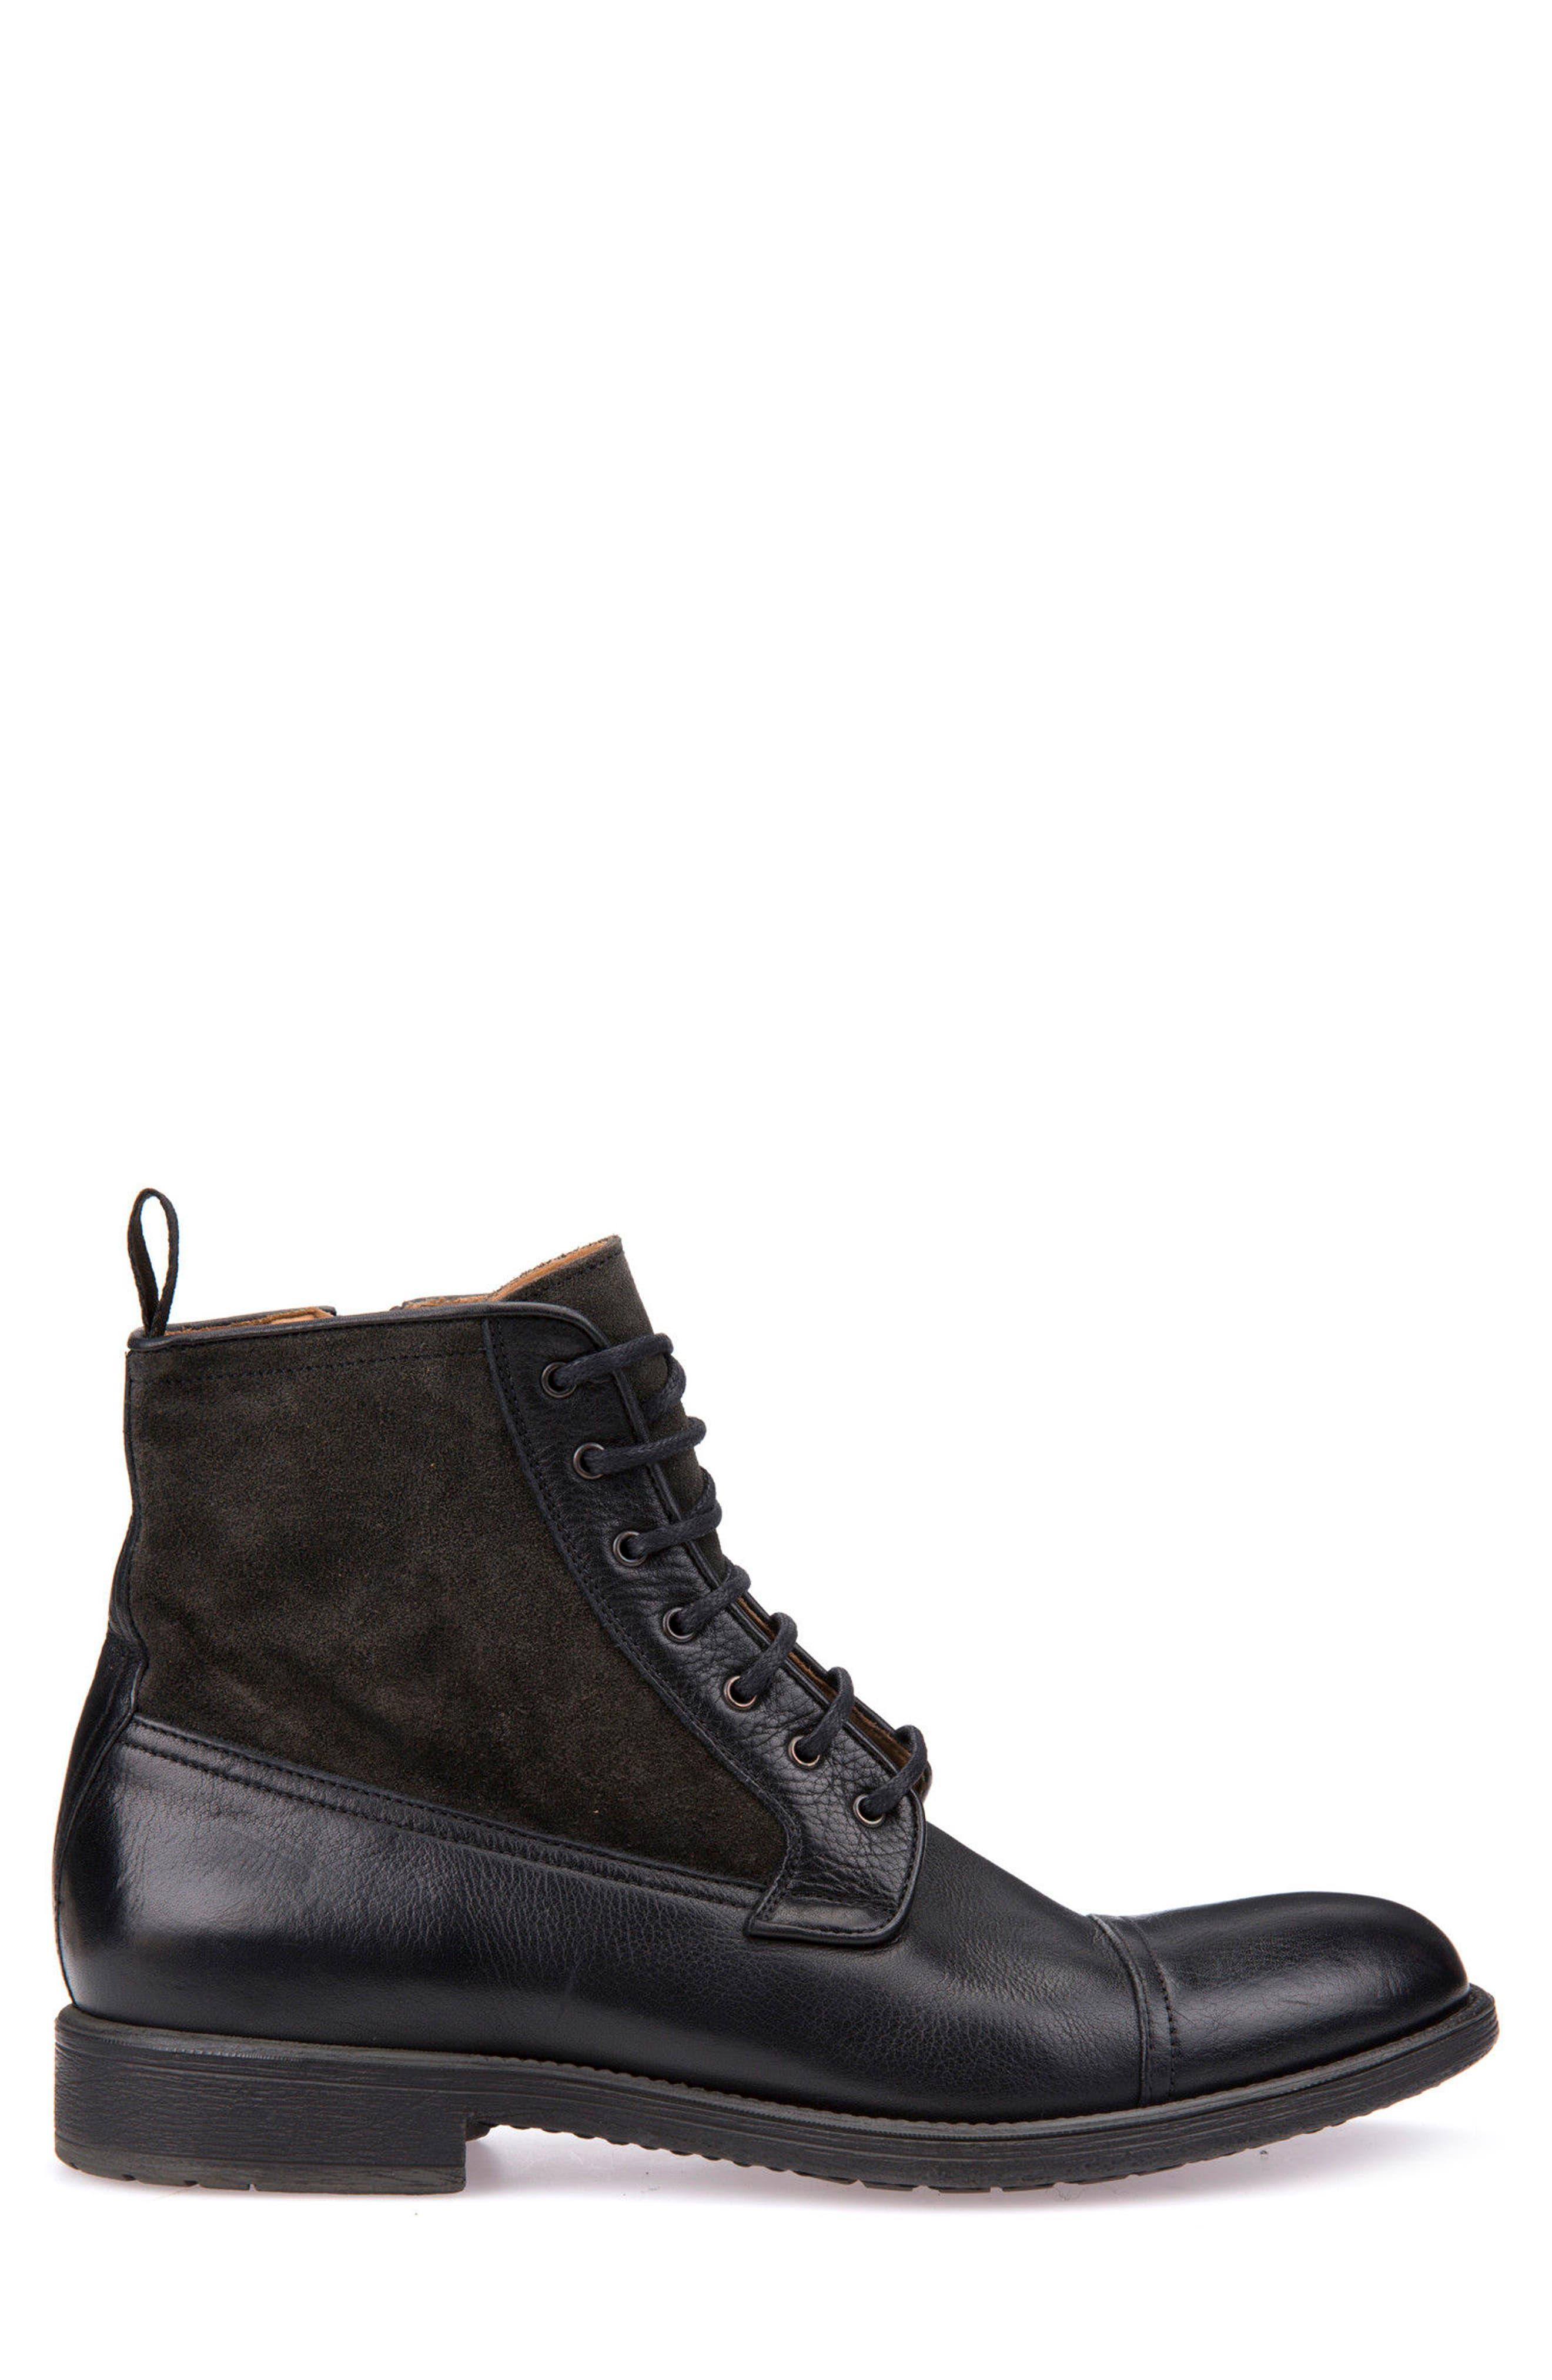 Jaylon 12 Cap-Toe Boot,                             Alternate thumbnail 3, color,                             001